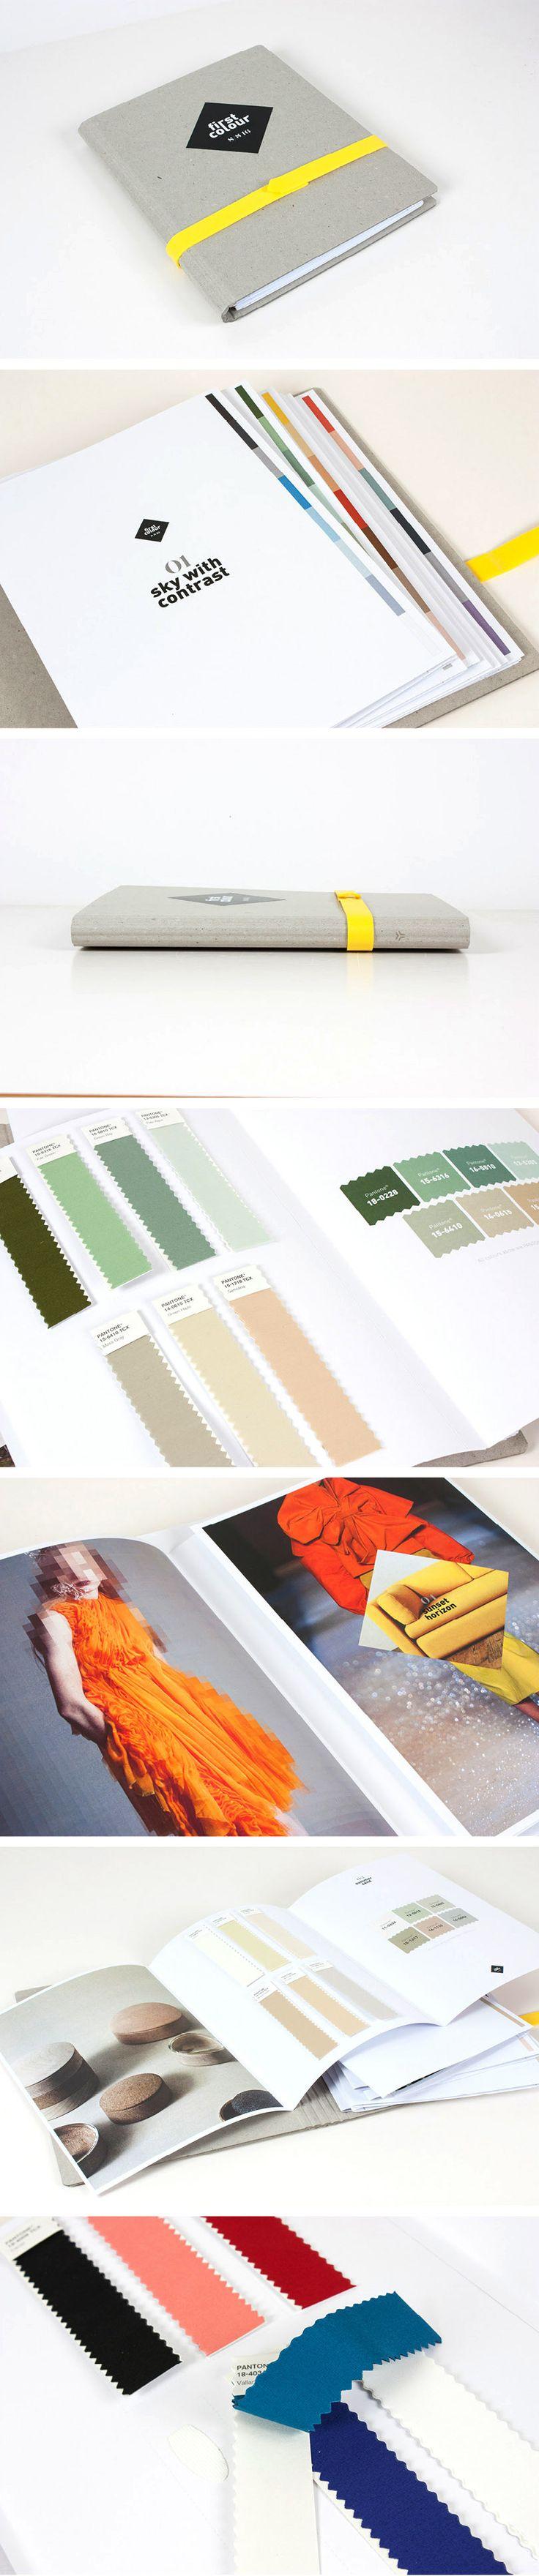 pej first colour. The world's earliest colour card! 24 months before season, made by pej gruppen - scandinavian trend institute. http://pejgruppen.com/pej-trend/pej-first-colour/